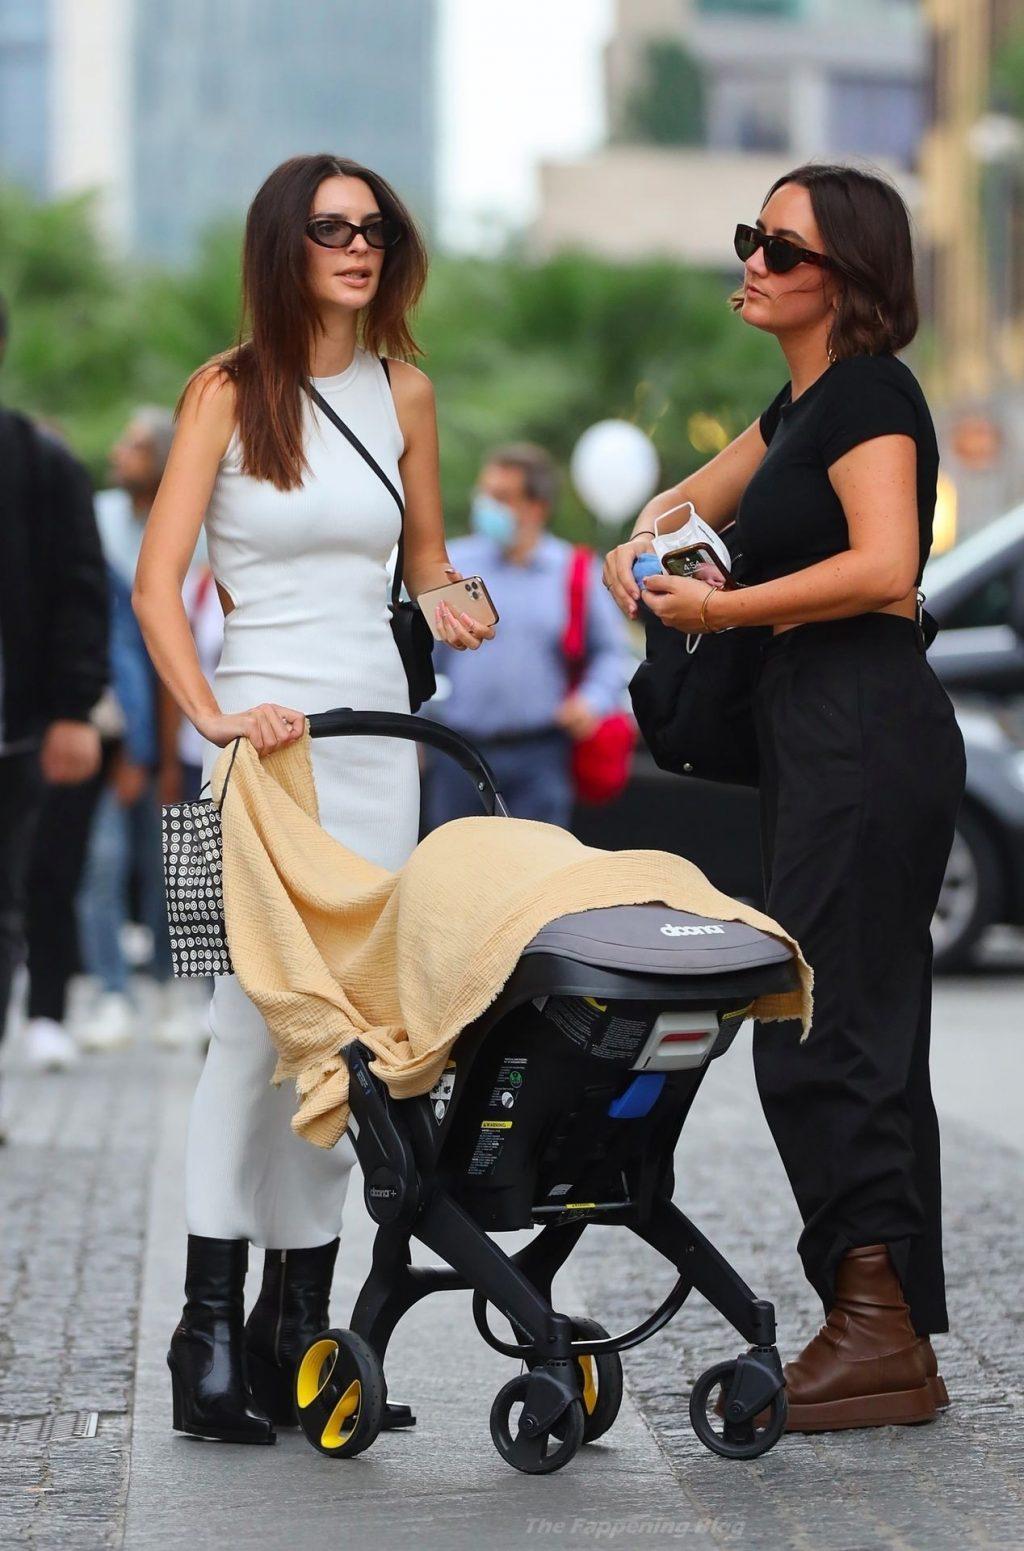 Emily Ratajkowski Takes Her Son For a Stroll with a Friend in Milan (31 Photos)